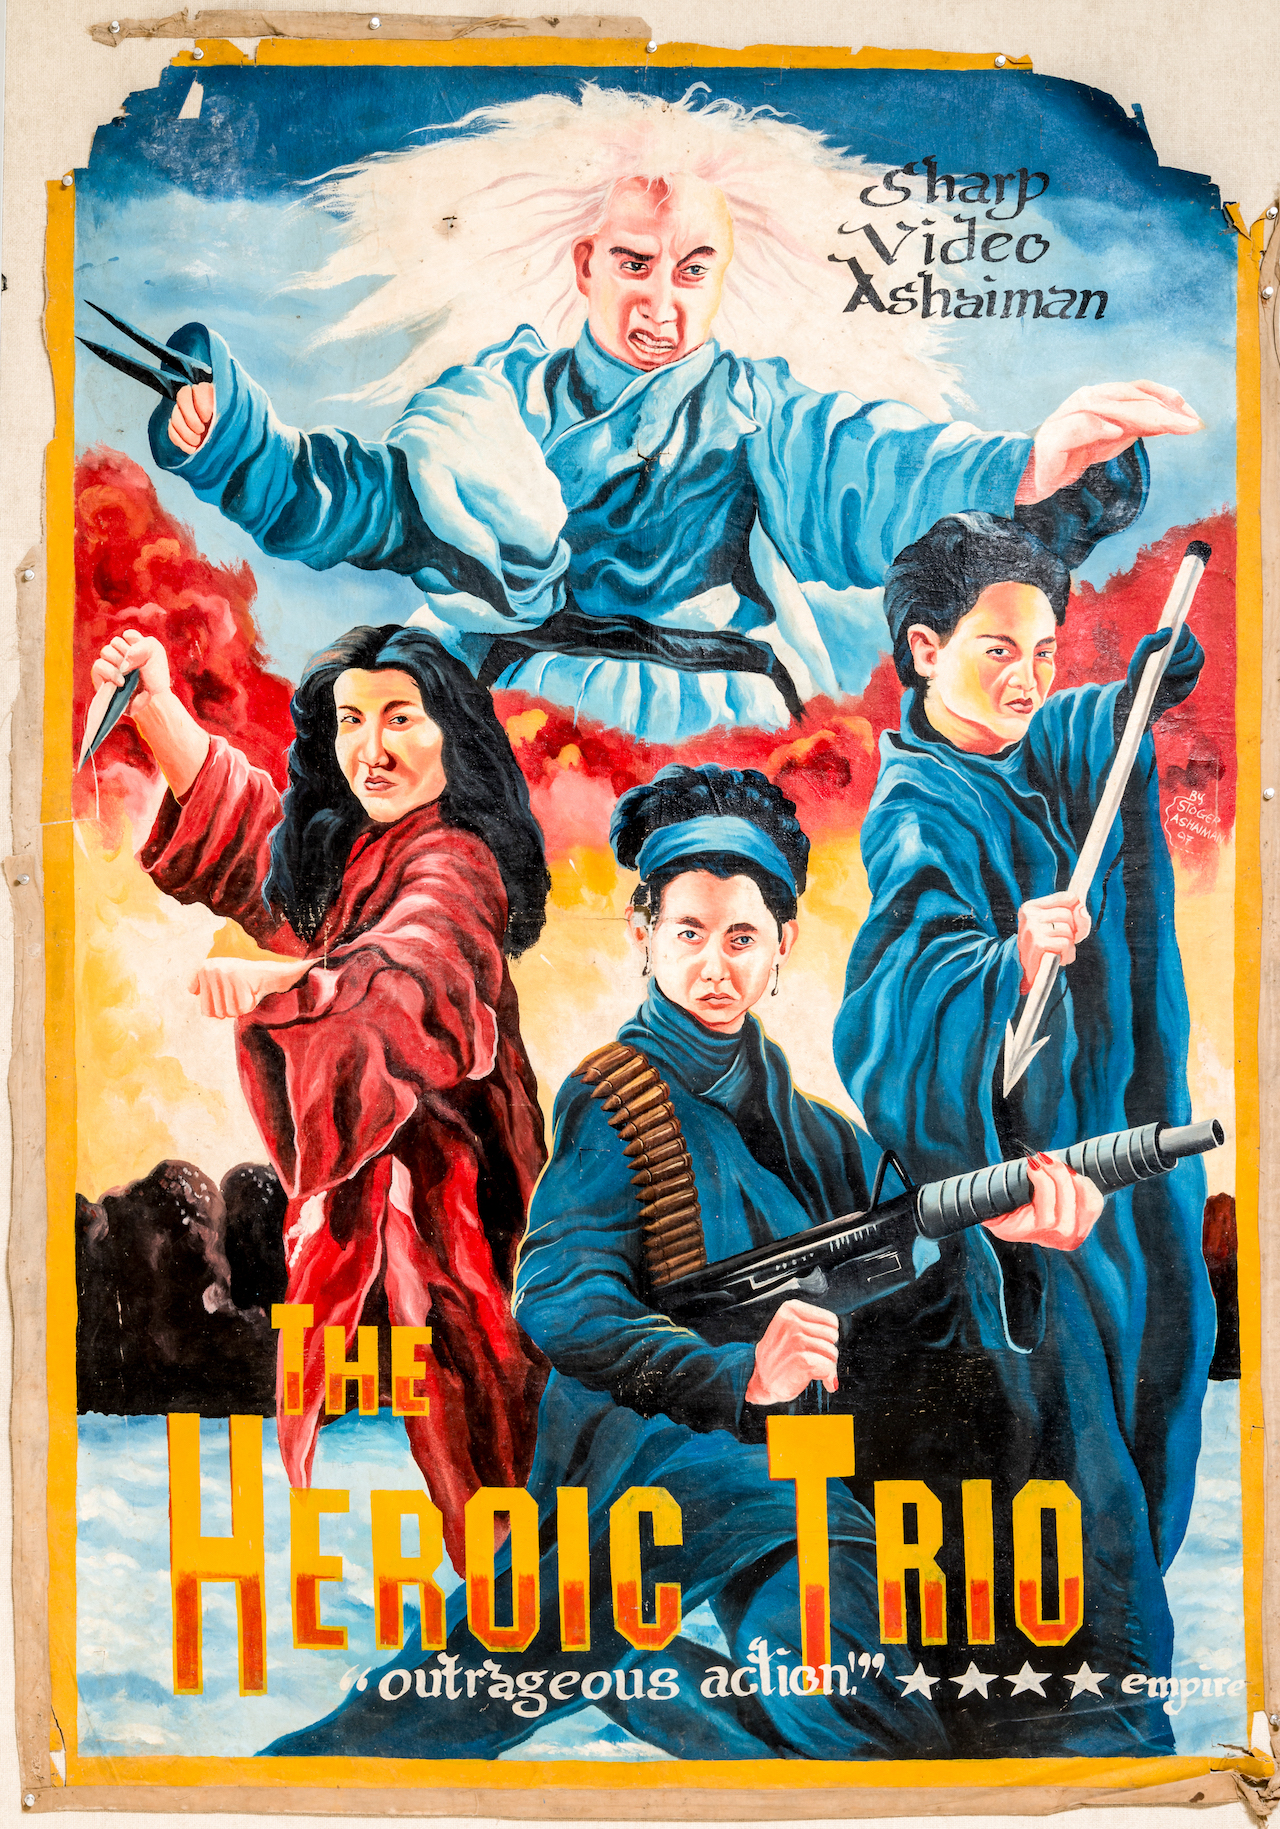 17. Stoger_The Heroic Trio